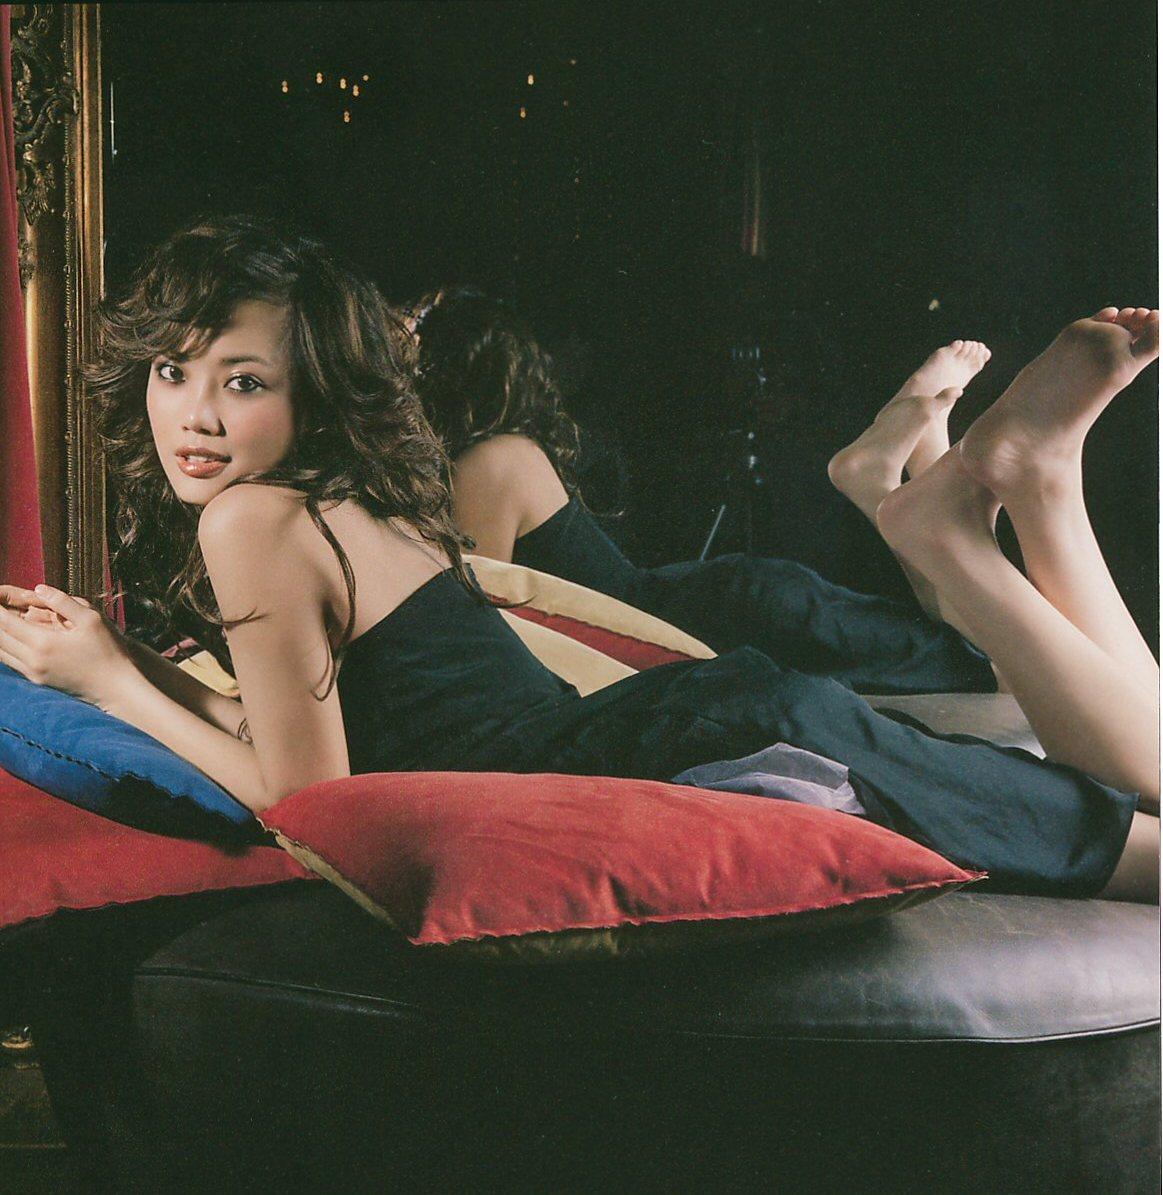 Joey yung porn joey yung porns pic